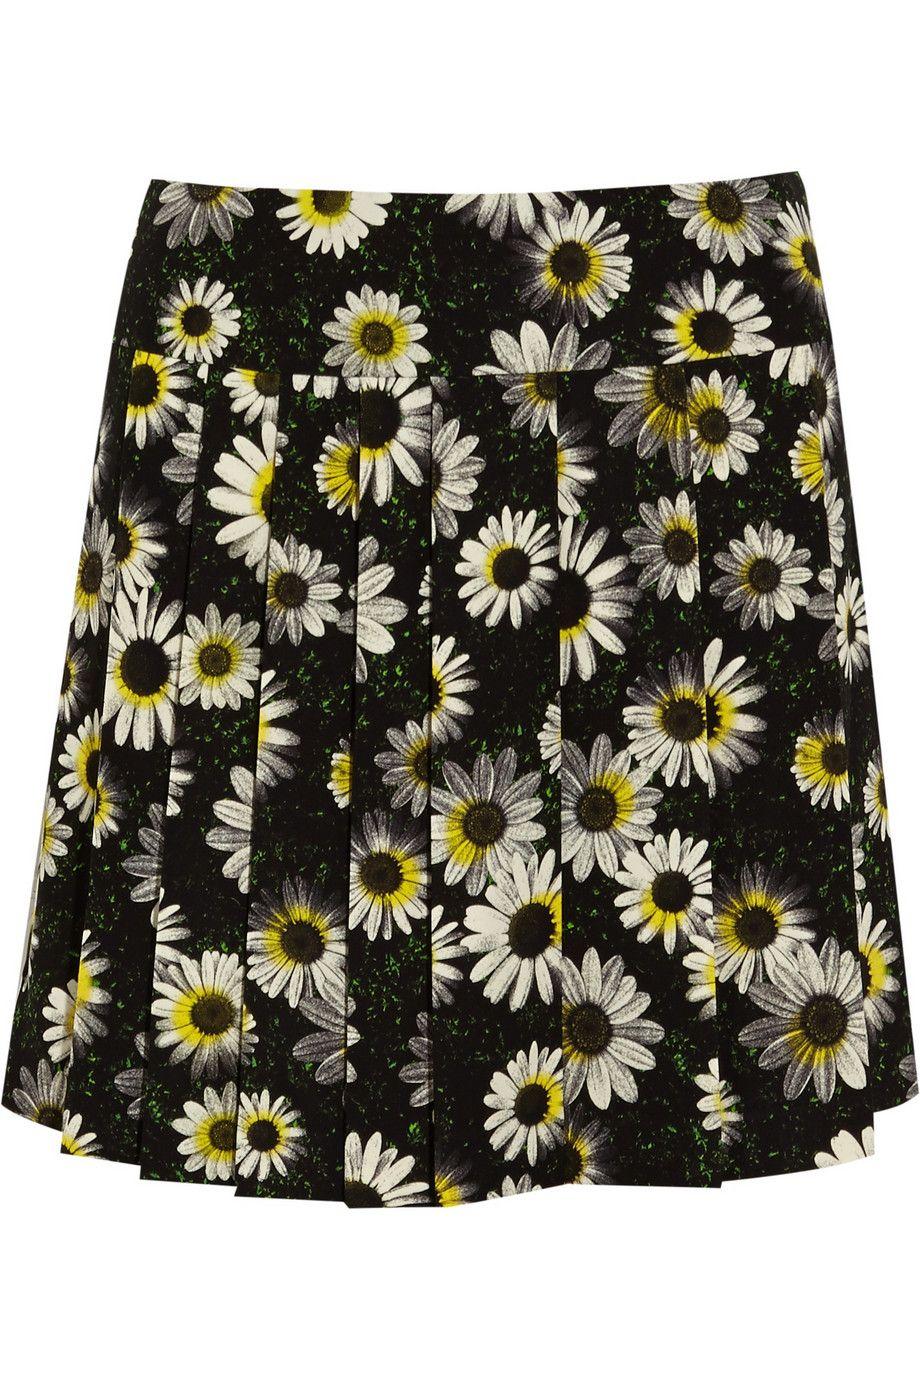 Moschino Cheap and ChicPrinted crepe skirt